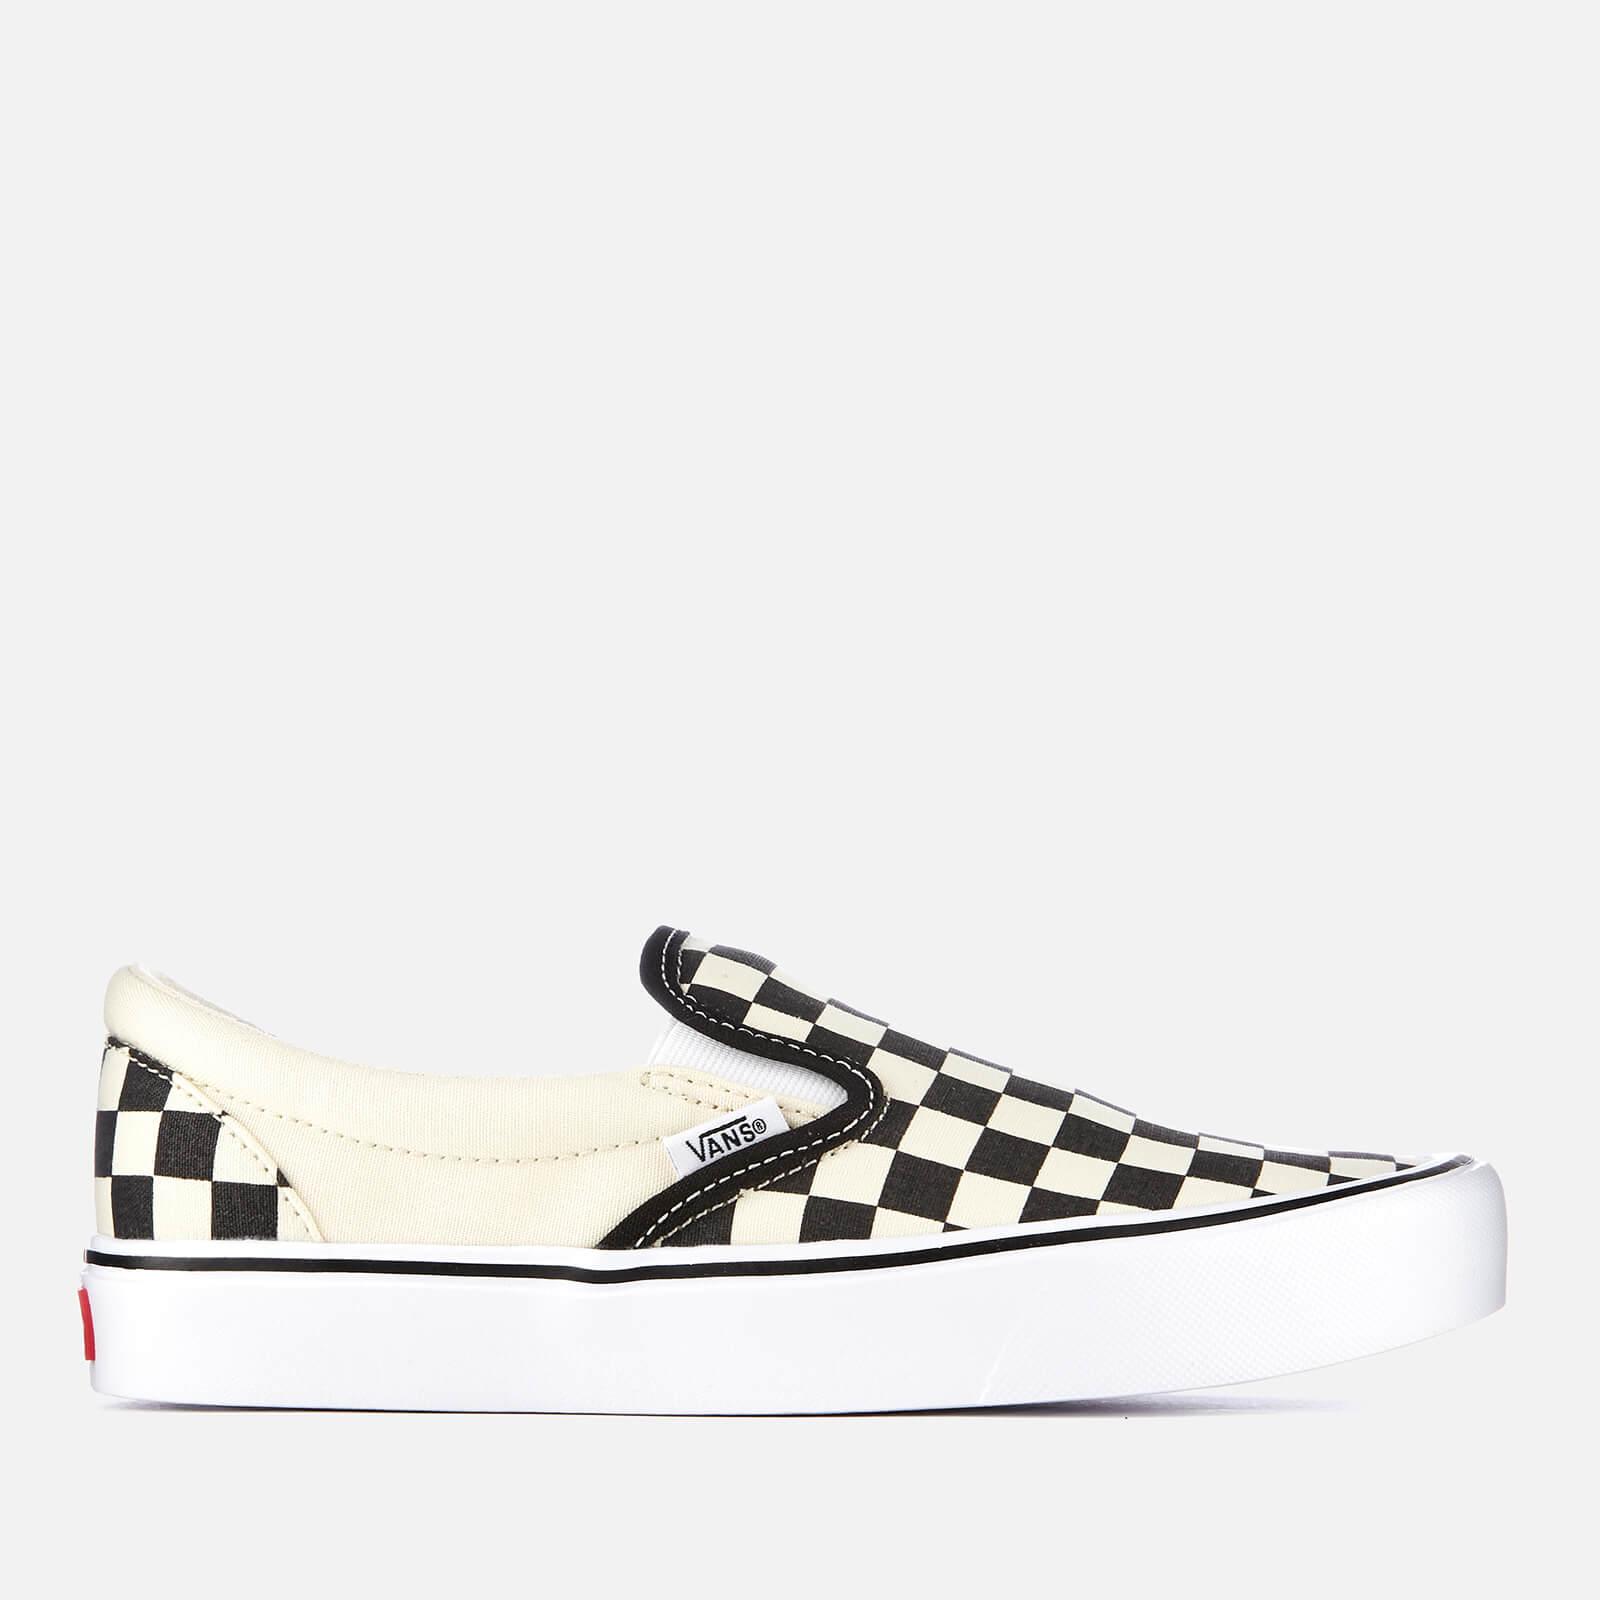 e0a2c446ec Vans Checkerboard Slip-On Lite Trainers - Black White Mens Footwear ...